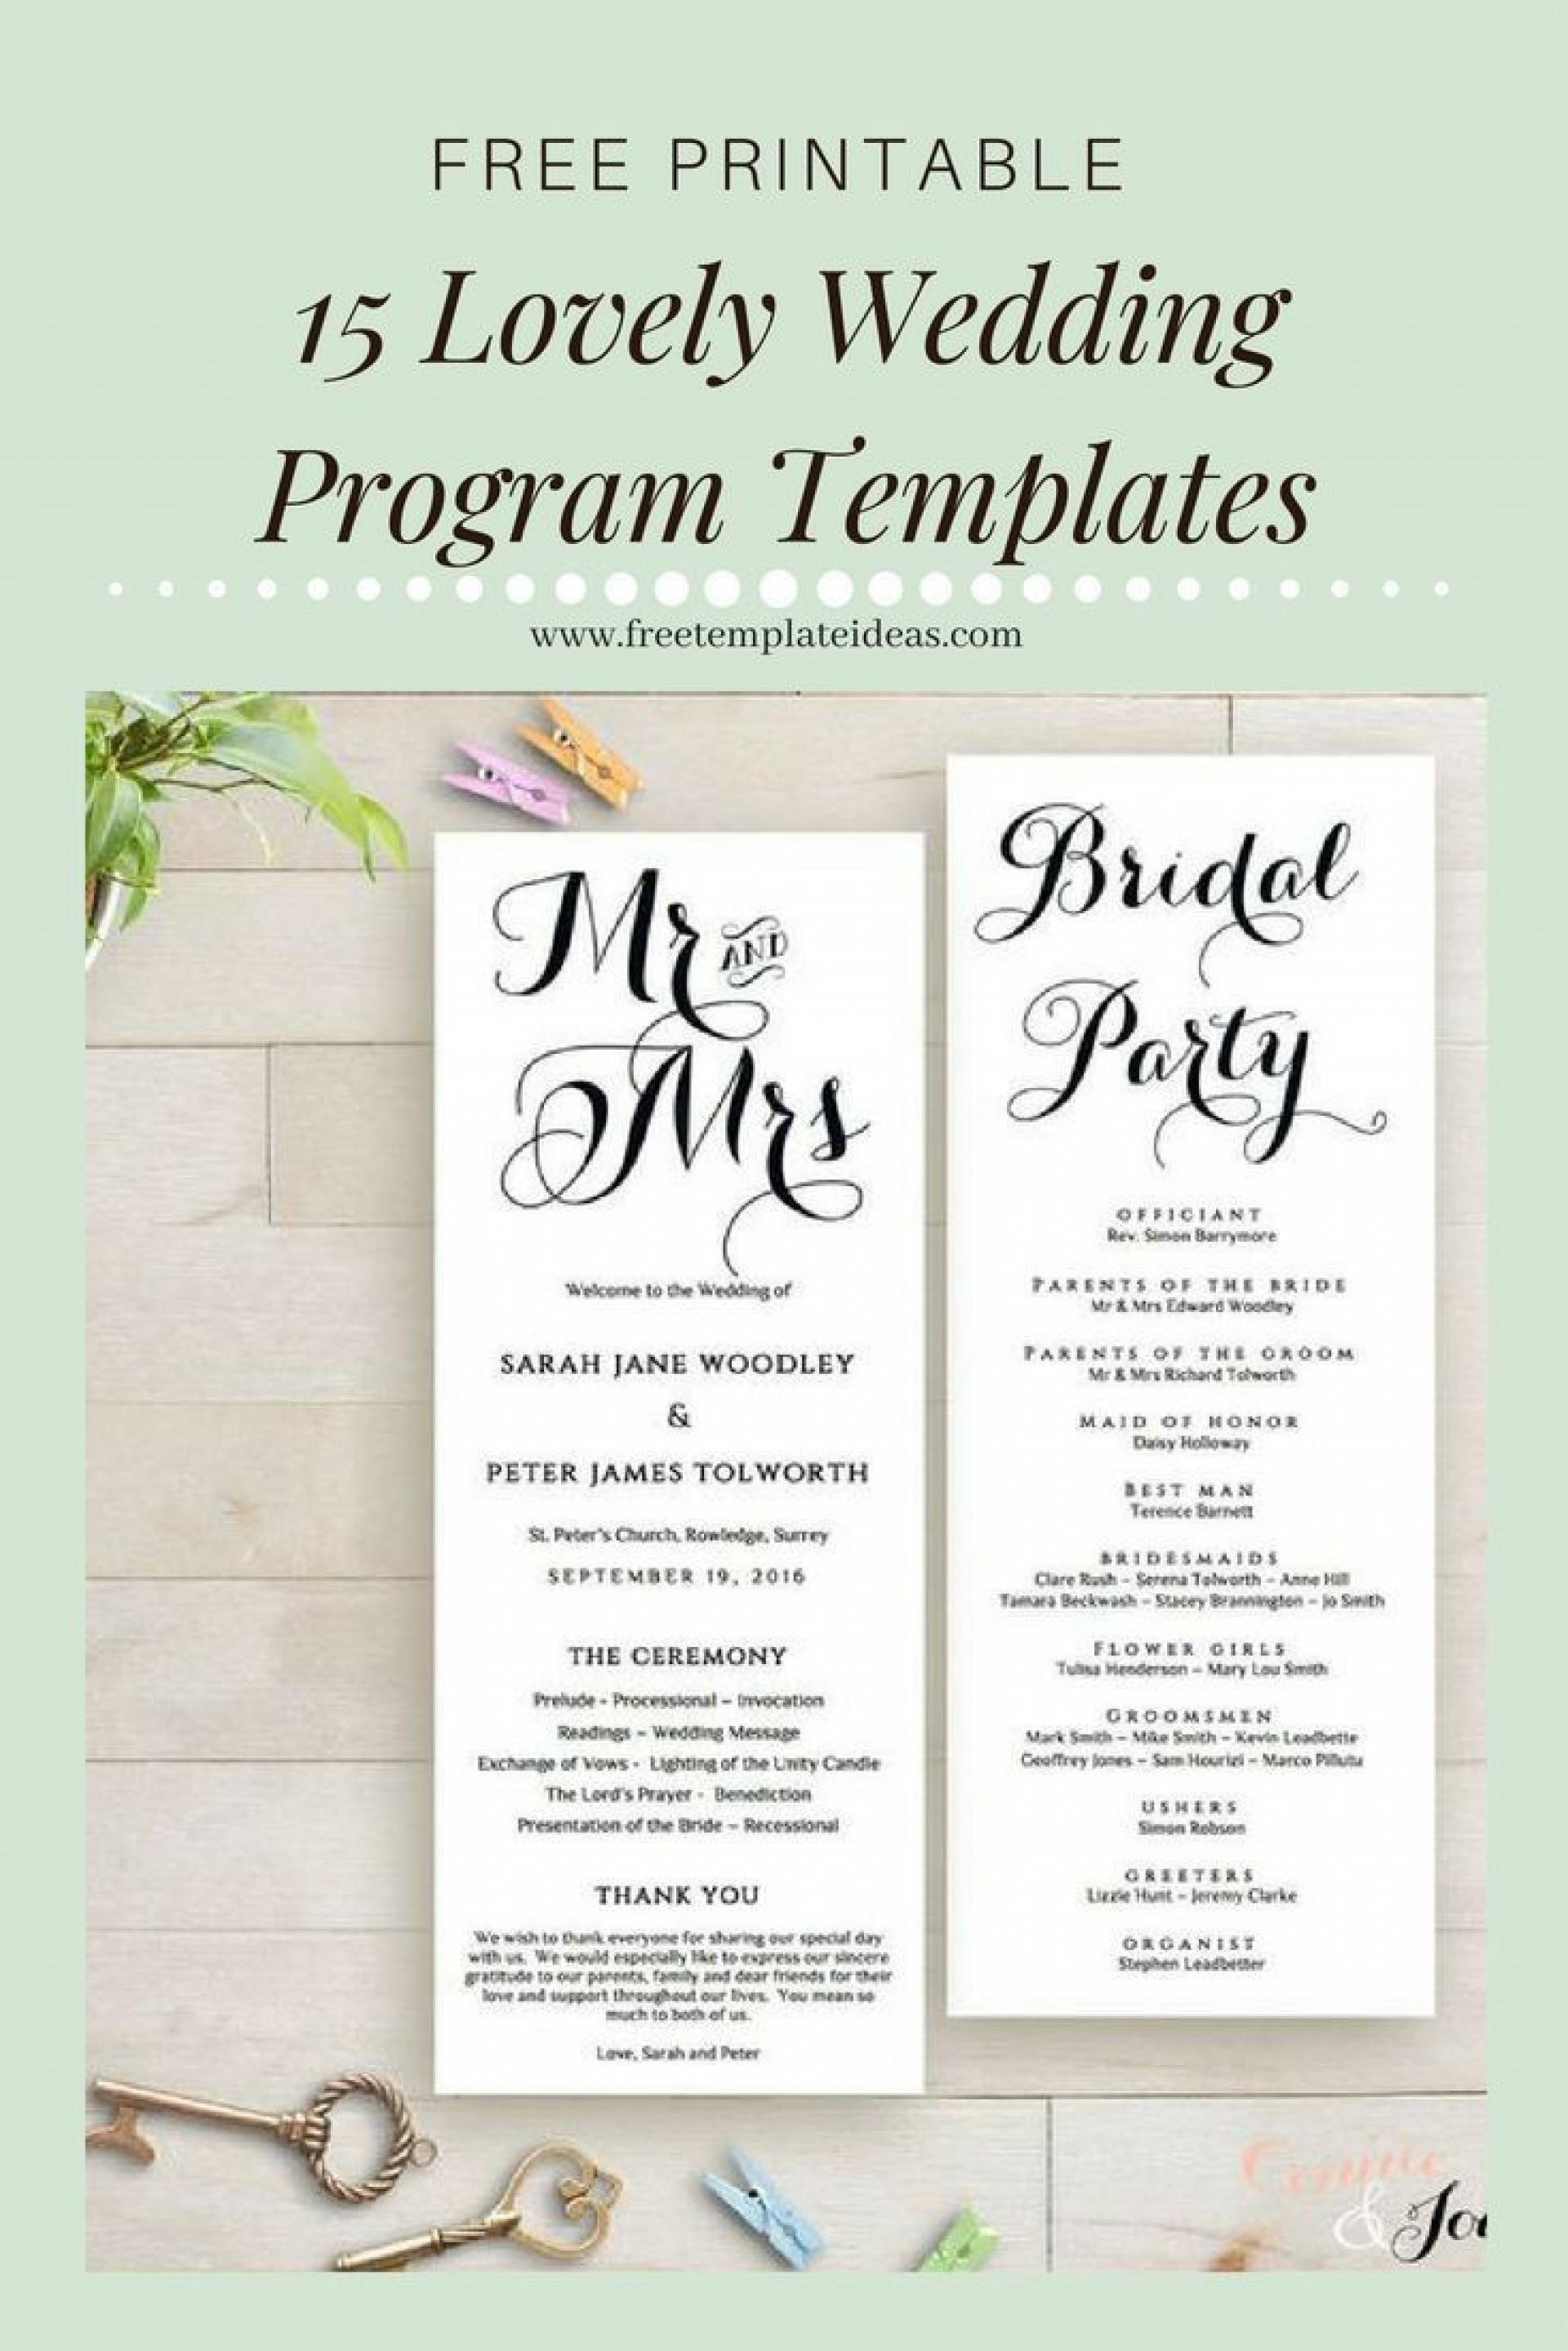 001 Unforgettable Free Wedding Program Template High Resolution  Templates Pdf Download Fan Word1920